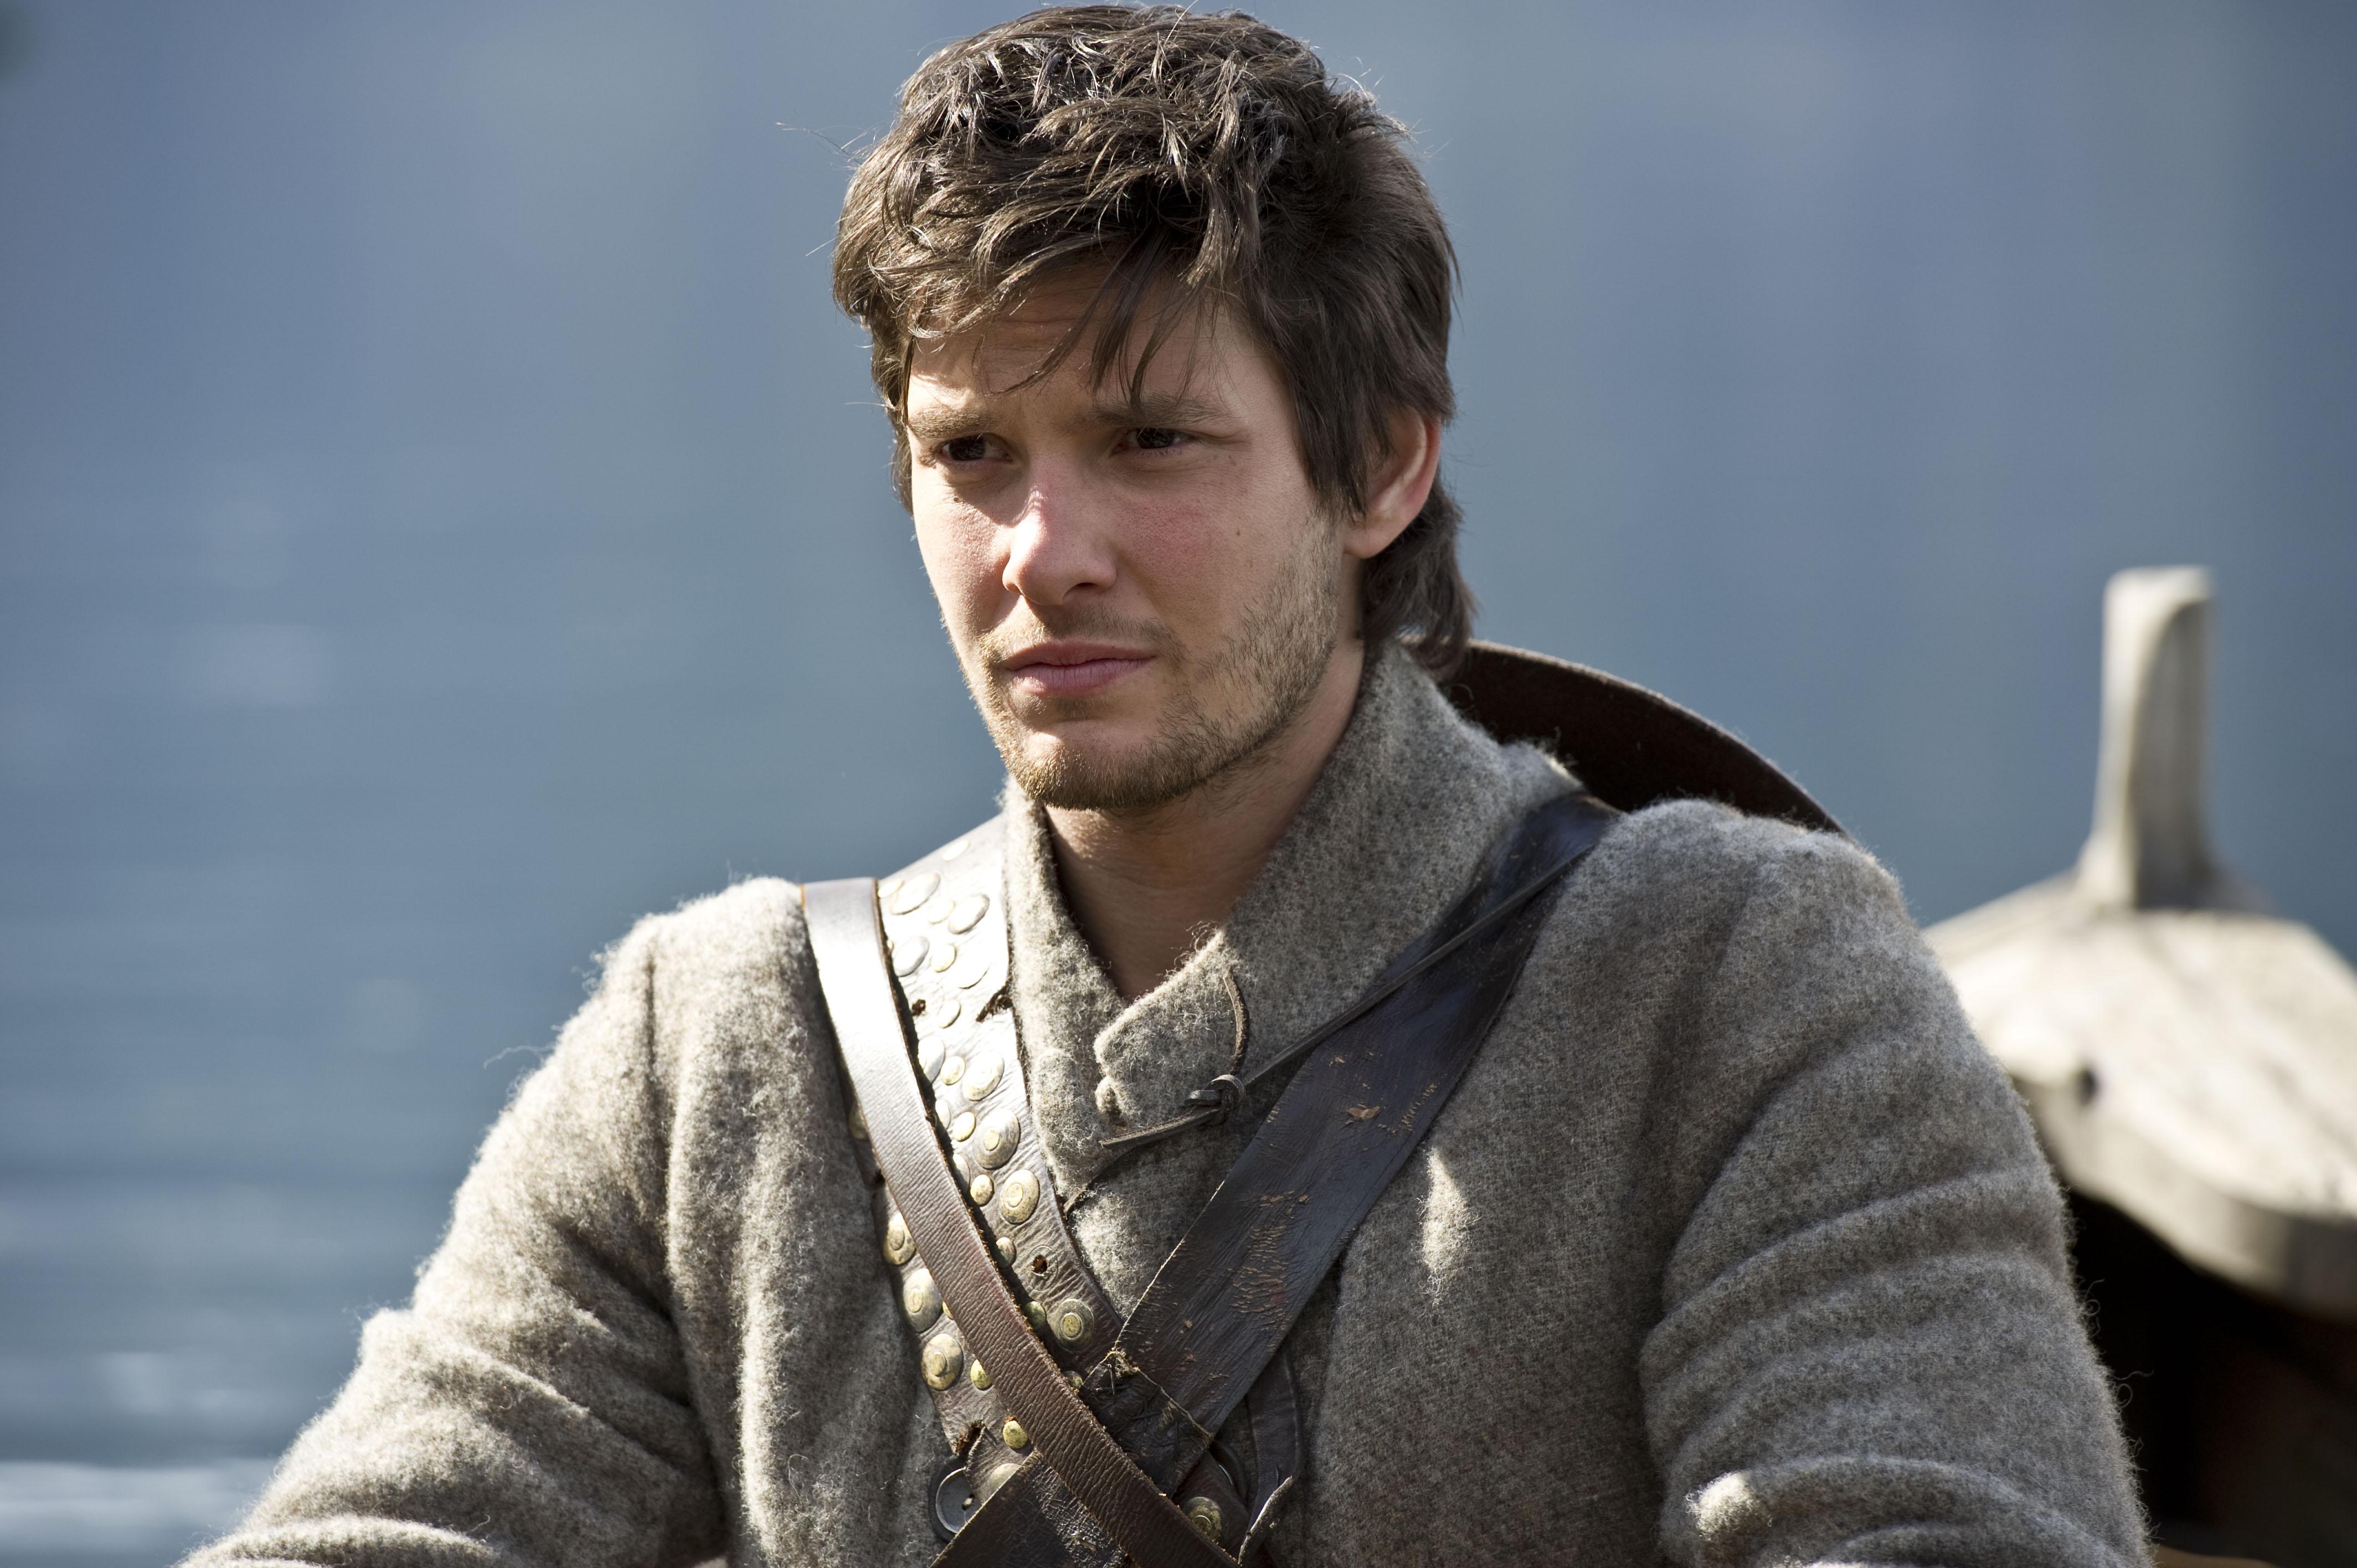 Game of Thrones Season 7 - Is Rhaegar Targaryen Coming?